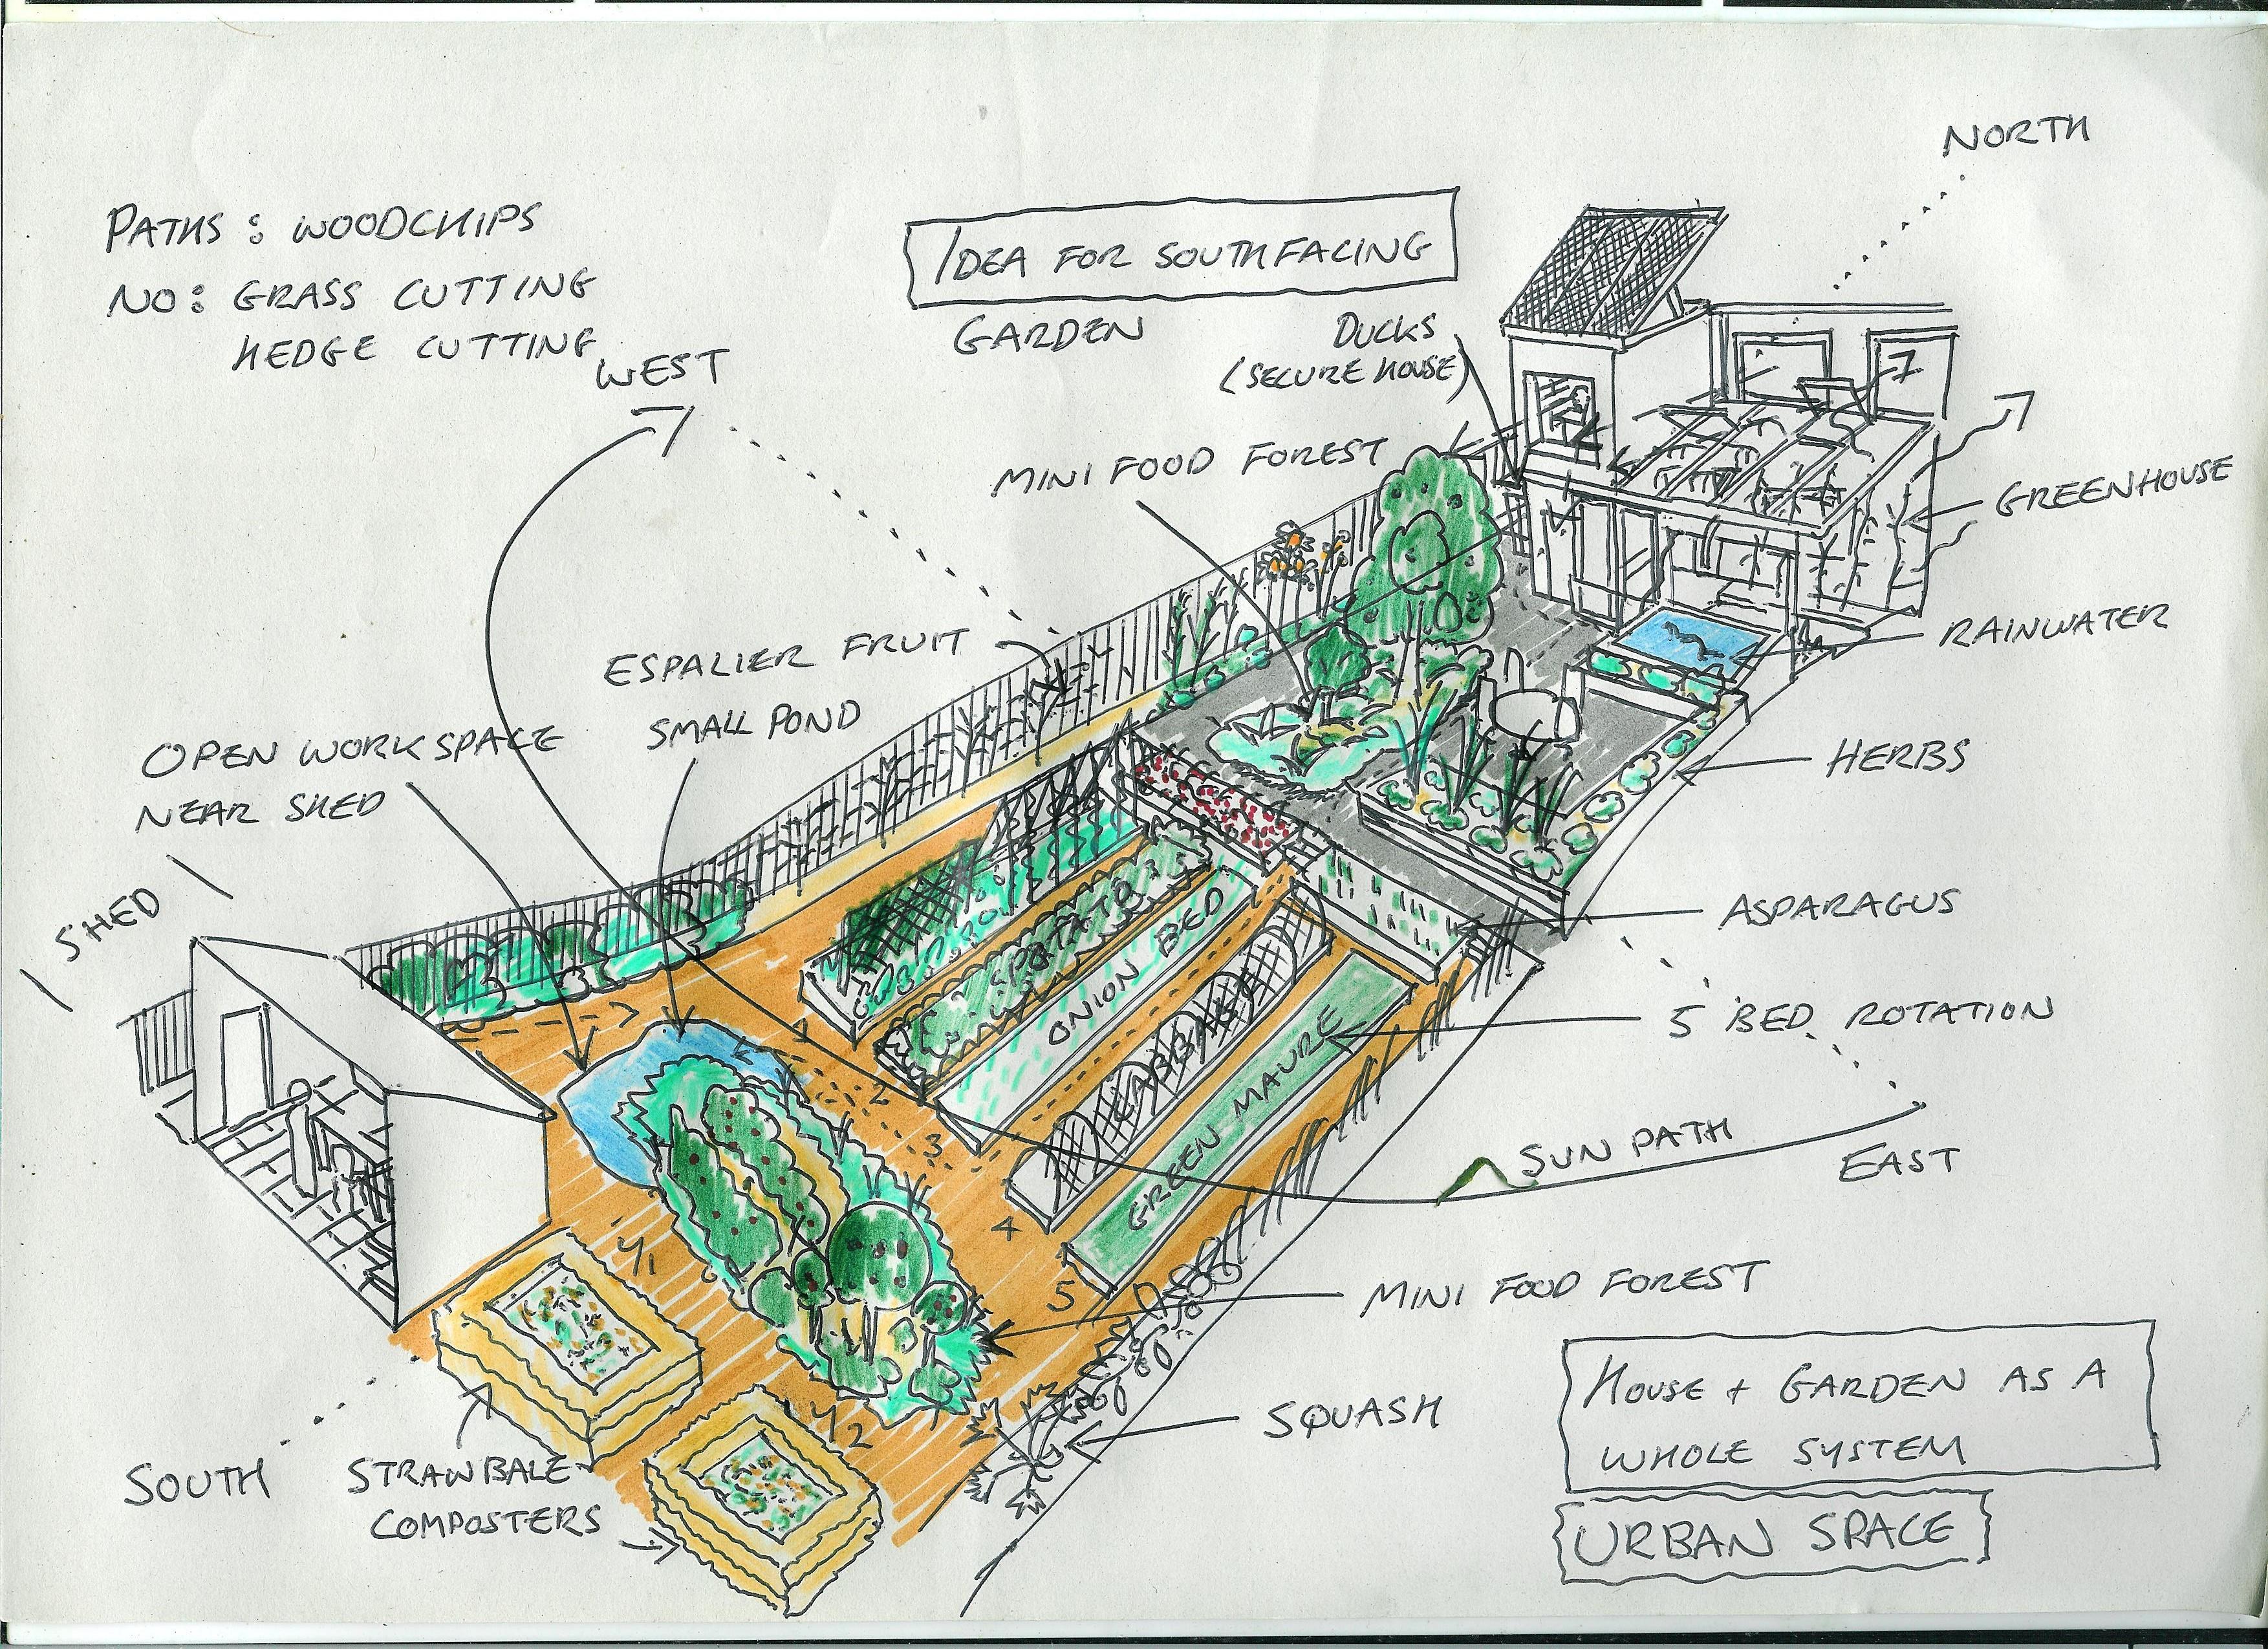 Garden Design 30 07 14